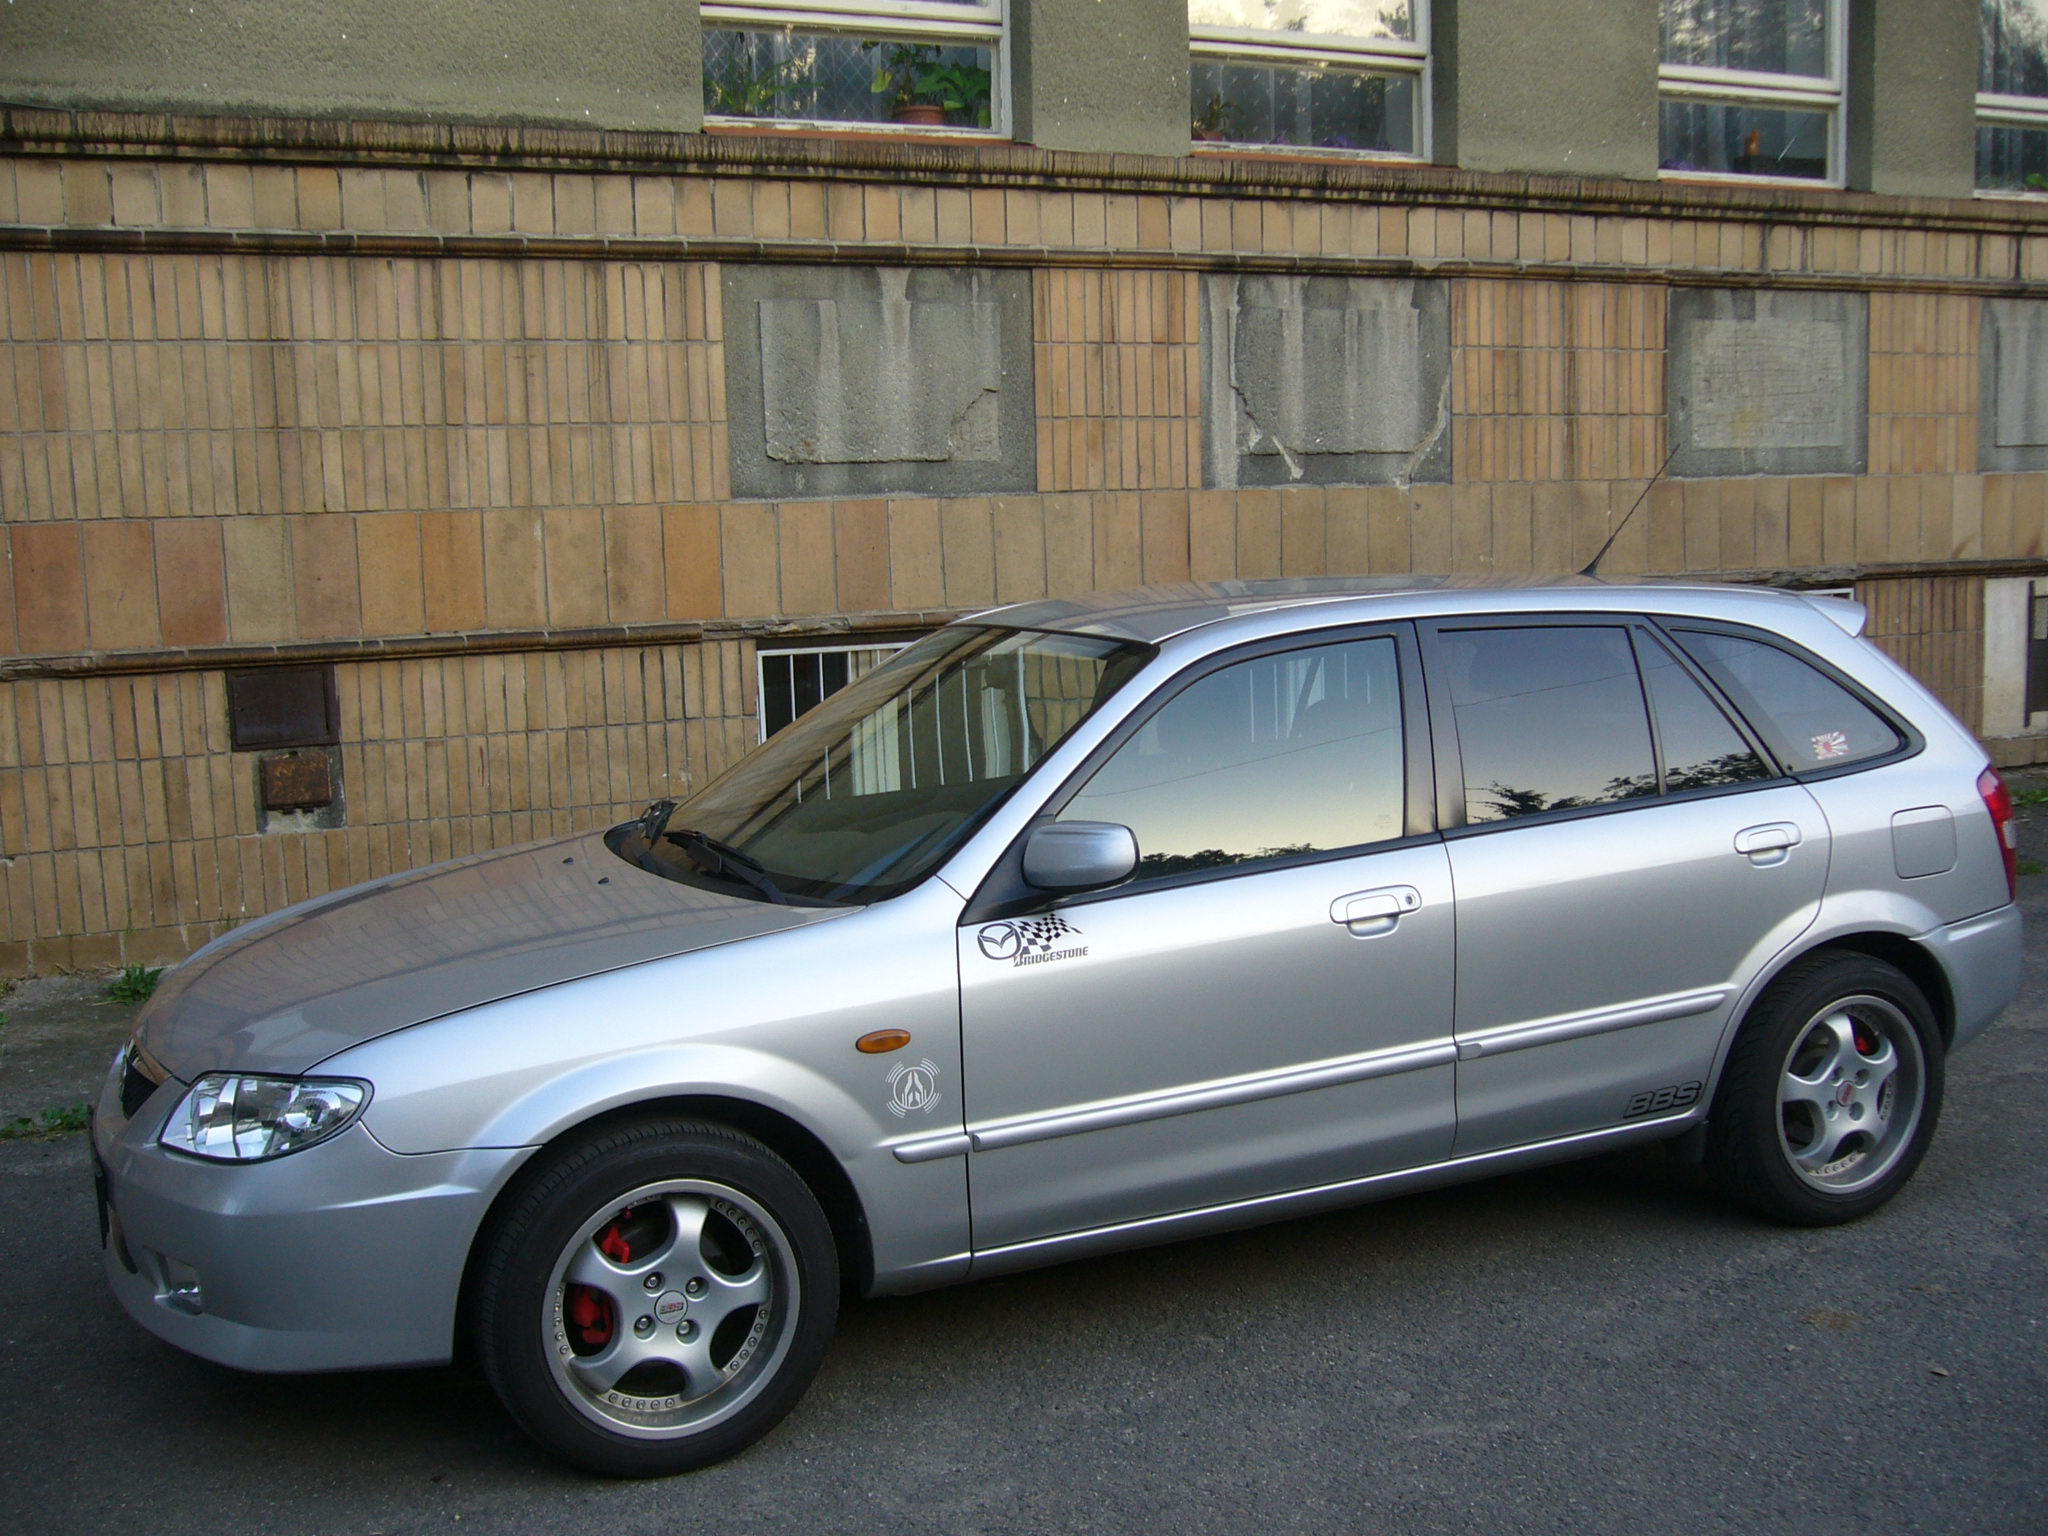 http://carsot.com/images/mazda-323-vi-bj-1998-2000-hatchback-3-door-exterior-1.jpg